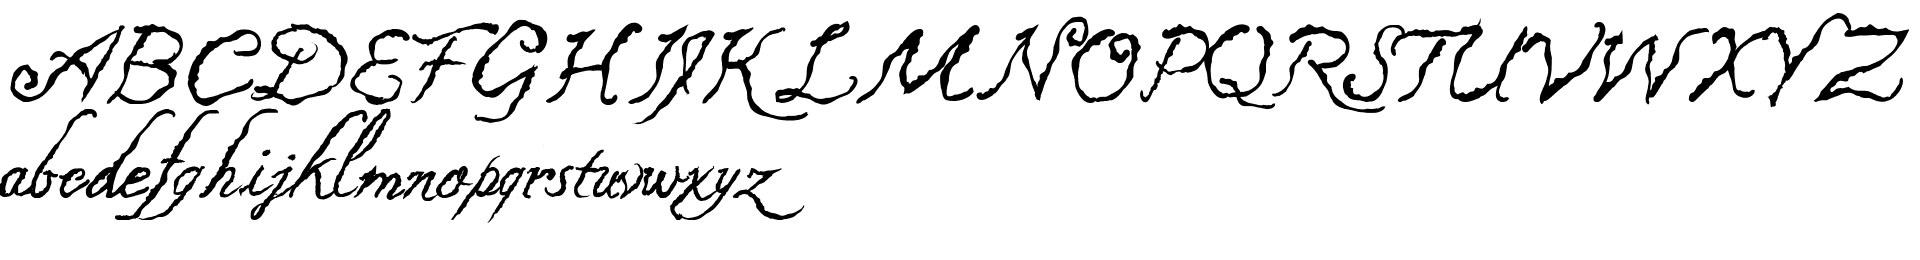 Caligraf 1435 Italic